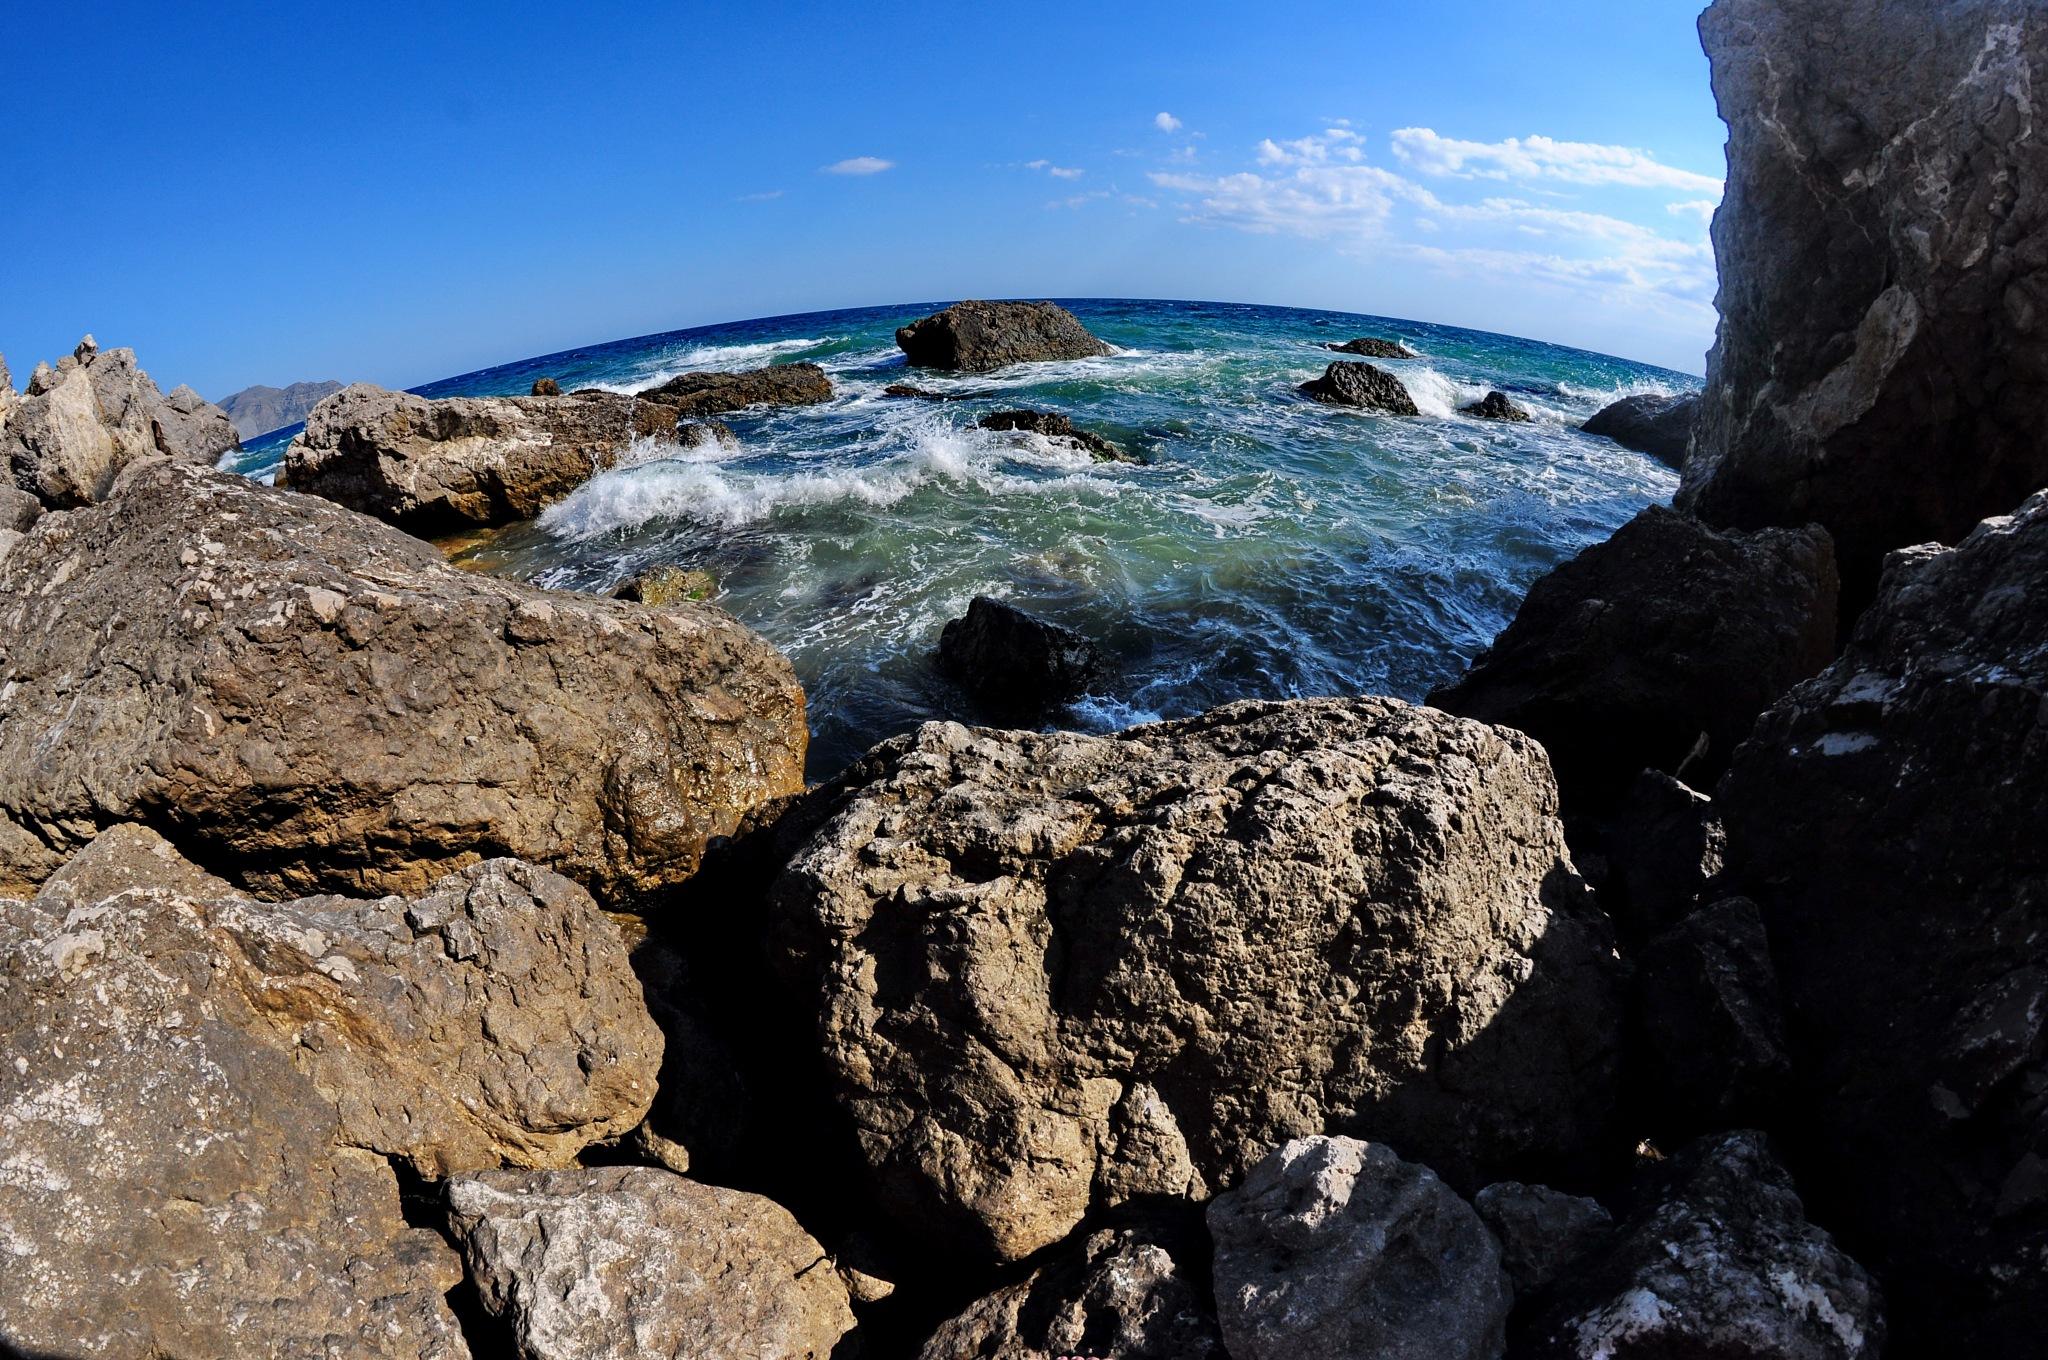 Black sea, Sudak, Crimea by vadsever58